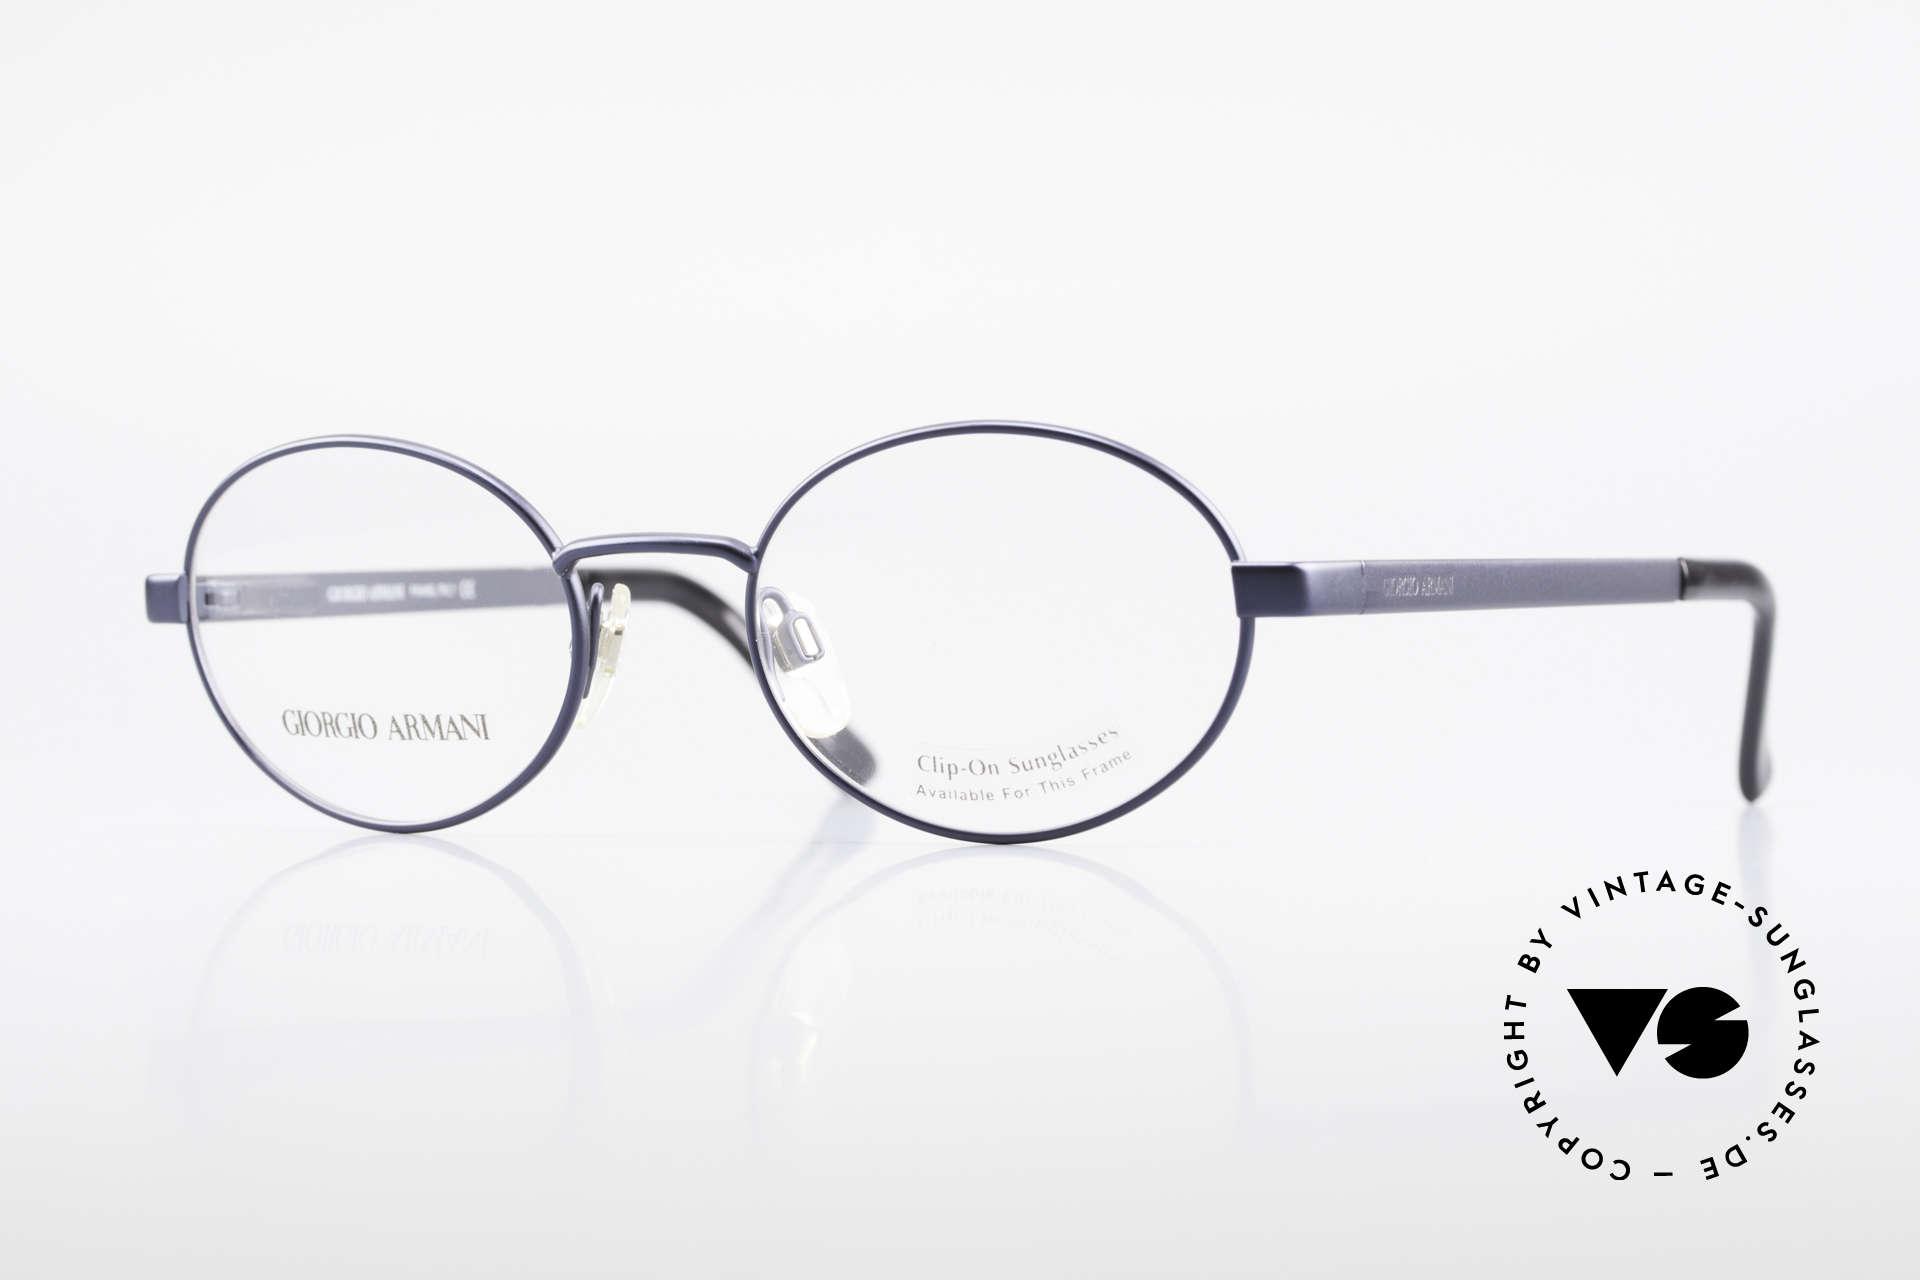 Giorgio Armani 257 90's Oval Vintage Eyeglasses, oval designer eyeglass-frame by GIORGIO ARMANI, Made for Men and Women